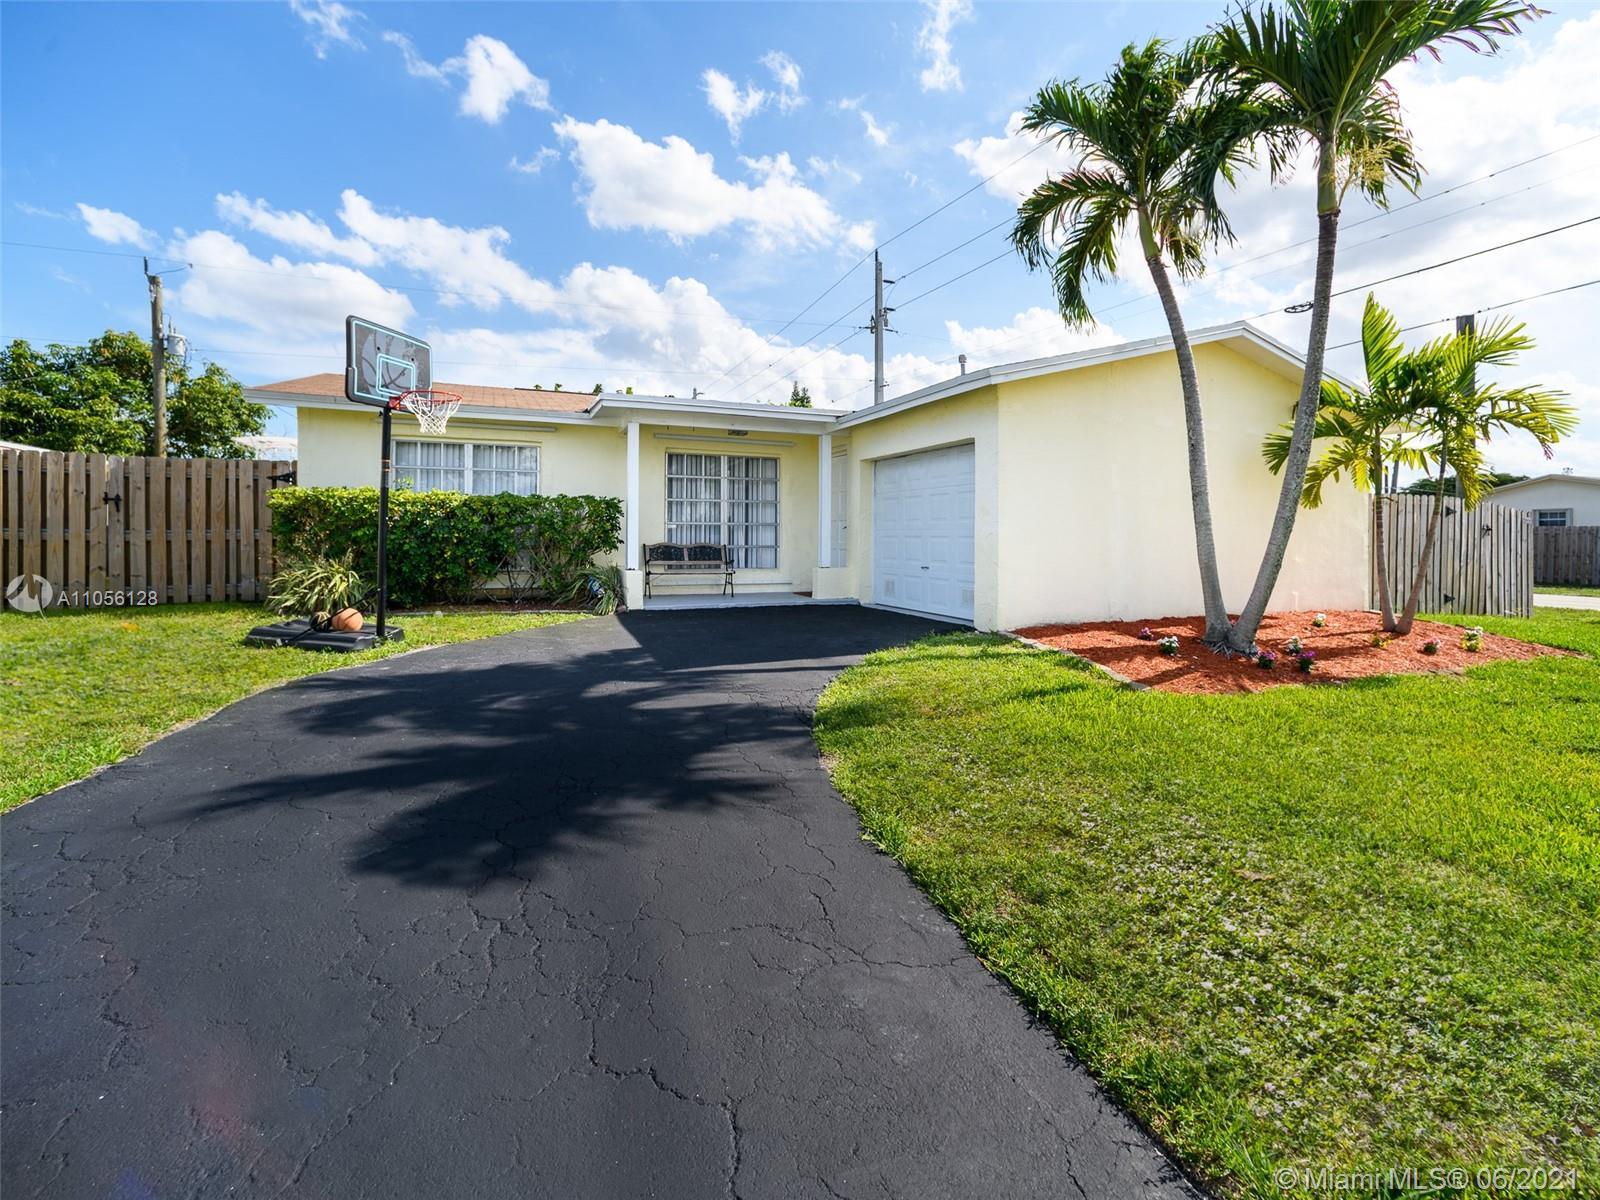 Sunrise Golf Village - 11500 NW 31st St, Sunrise, FL 33323